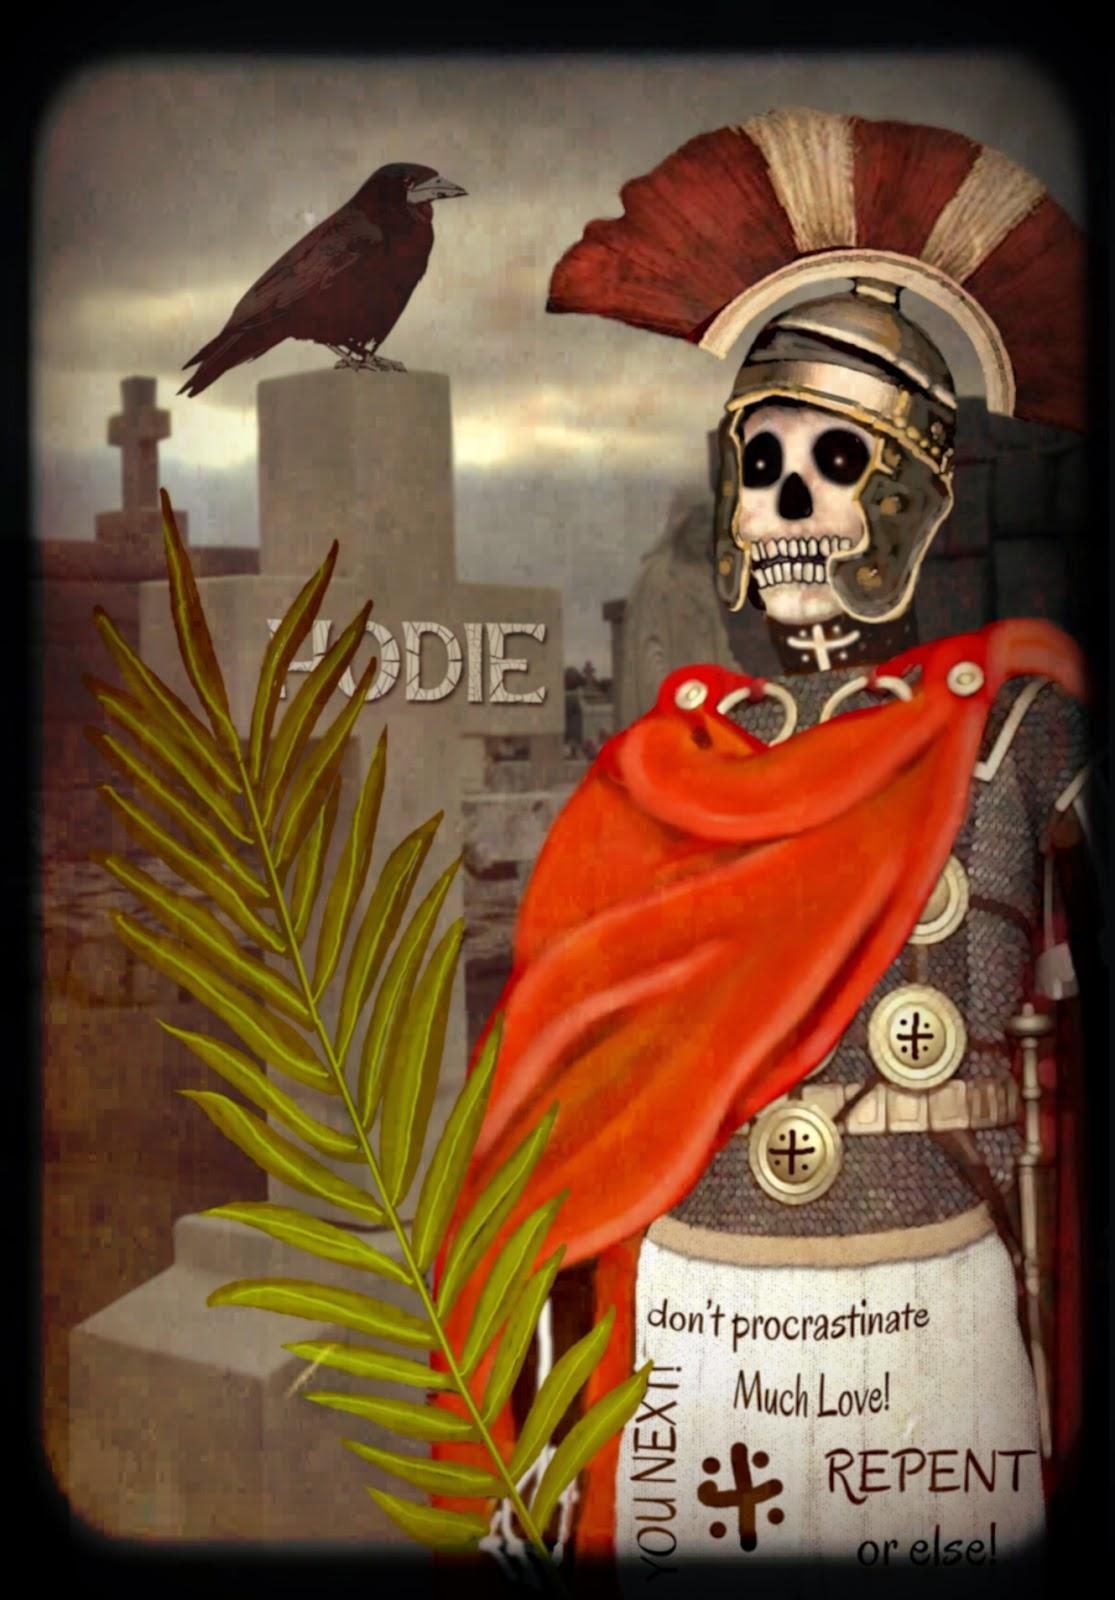 Saint Expedite as Baron Samedi in New Orleans Voudou